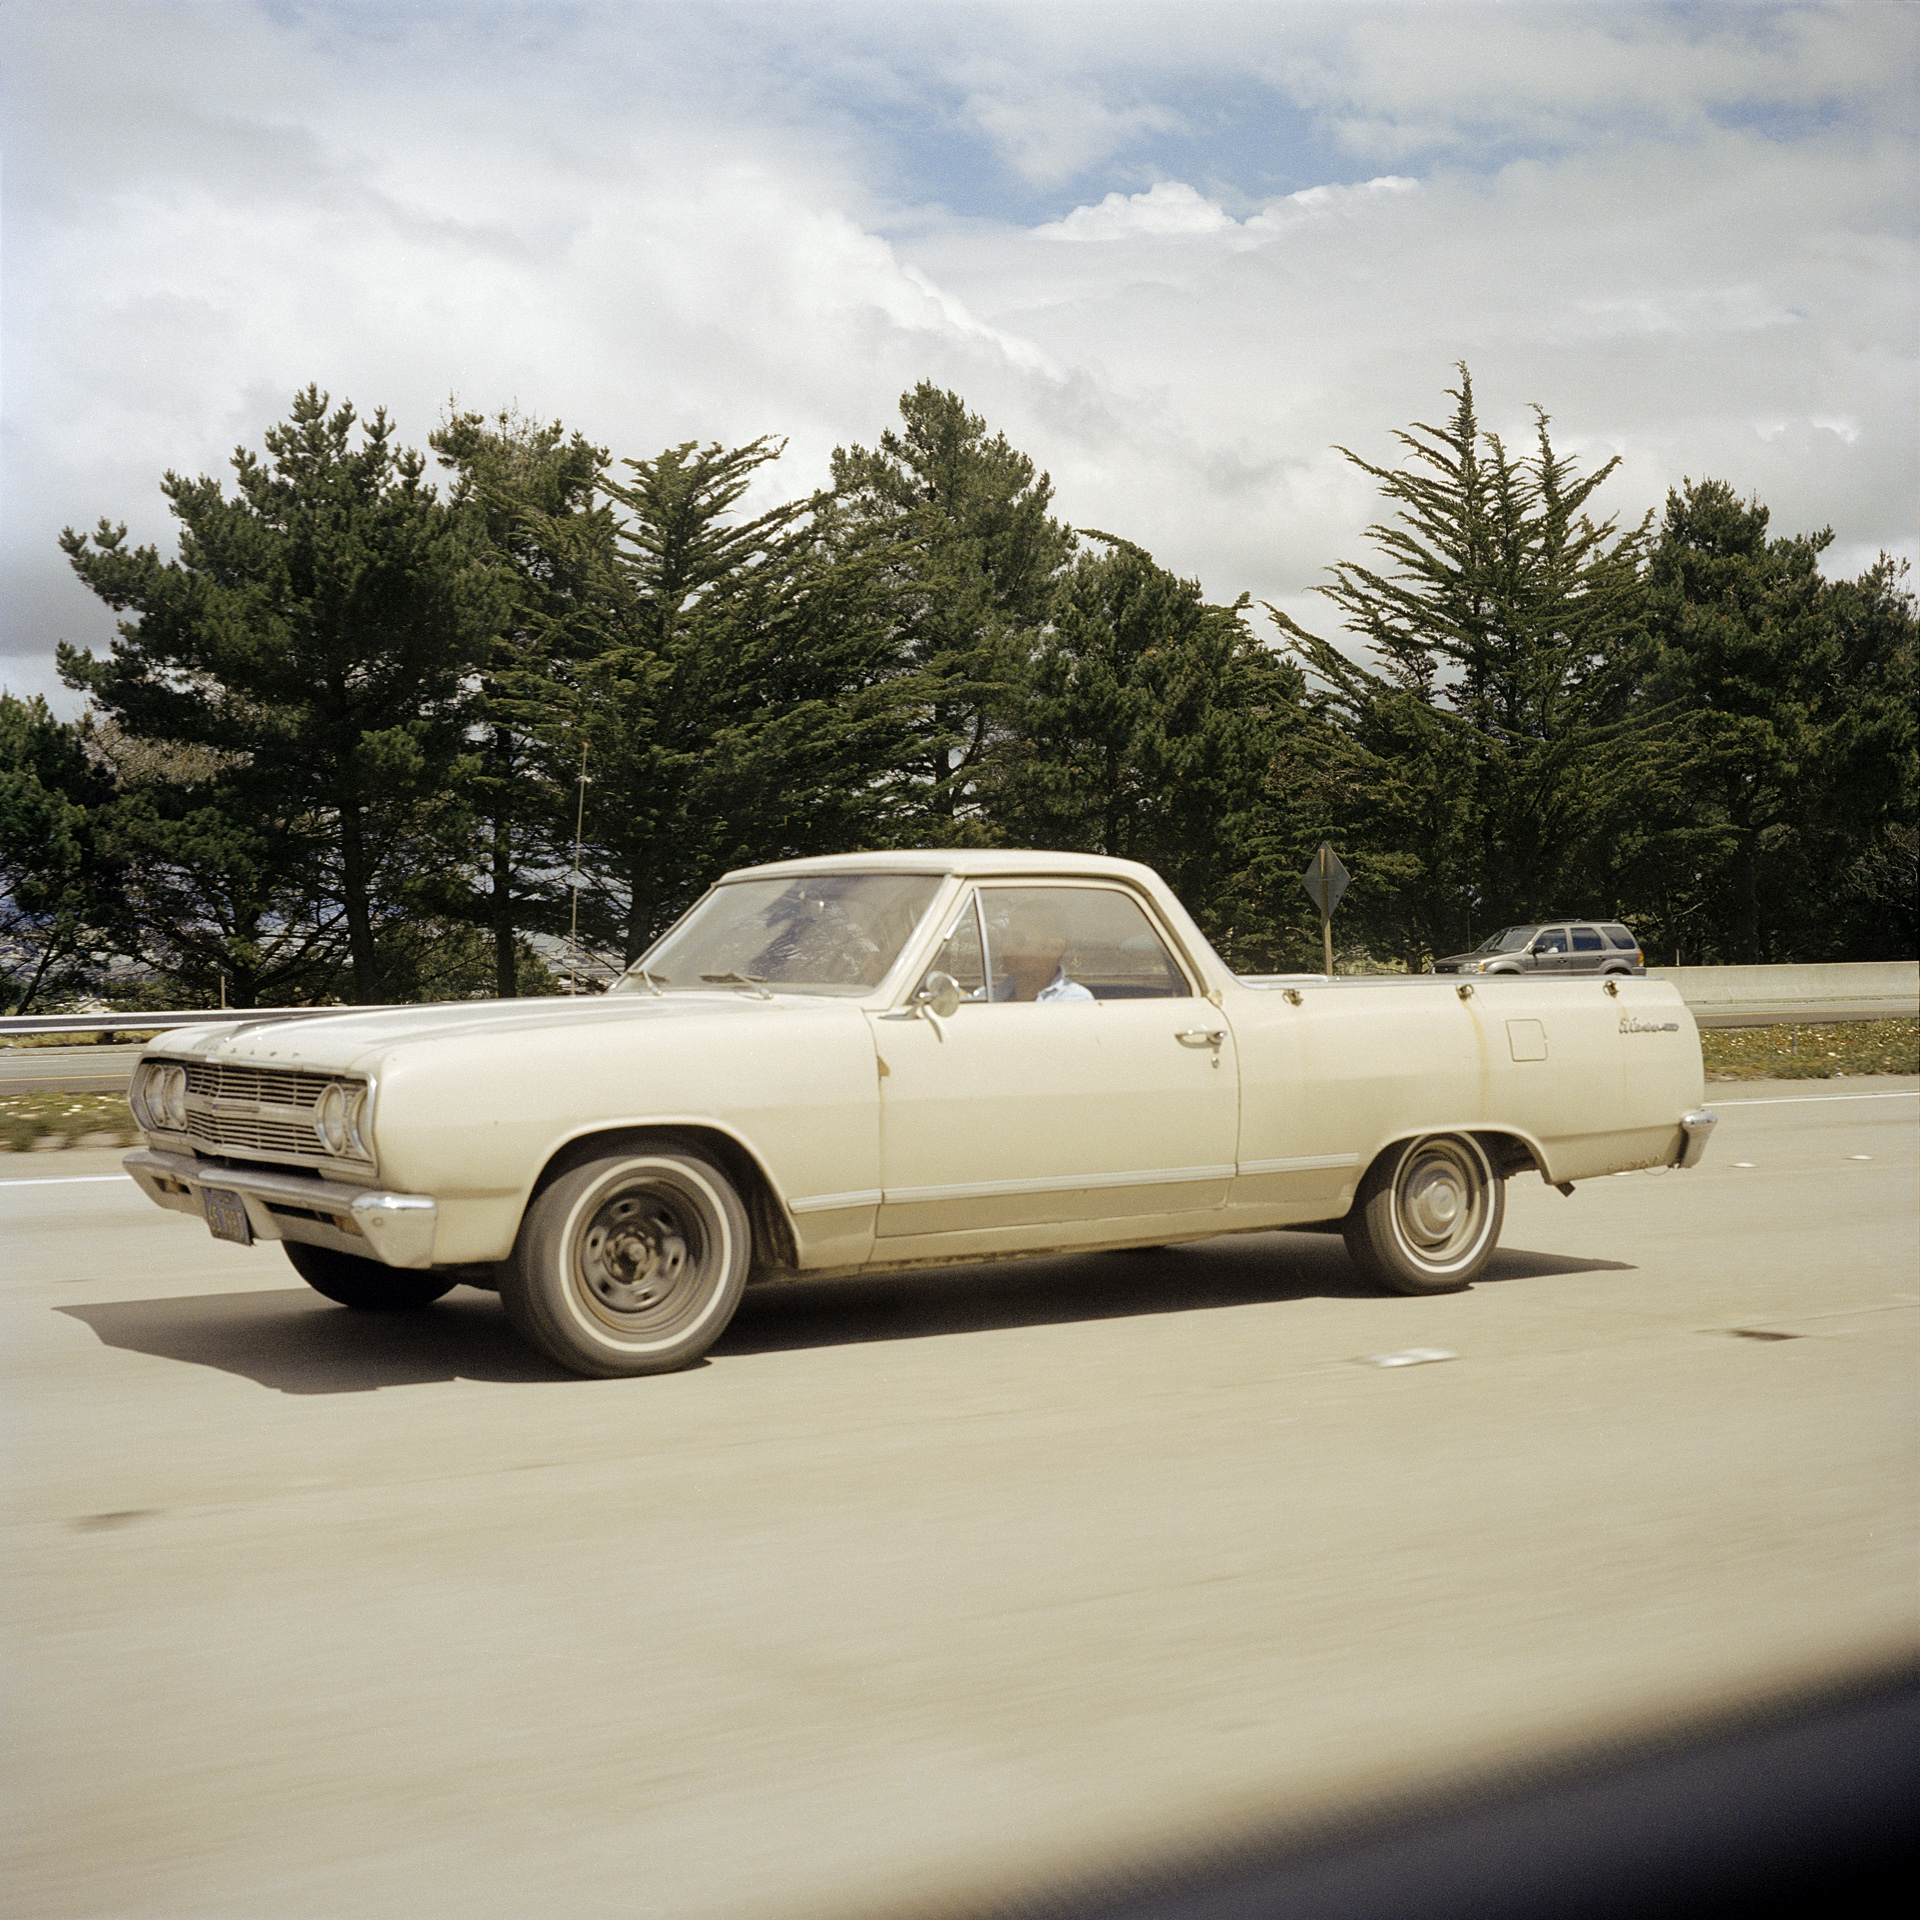 Chevrolet El Camino on I-280.